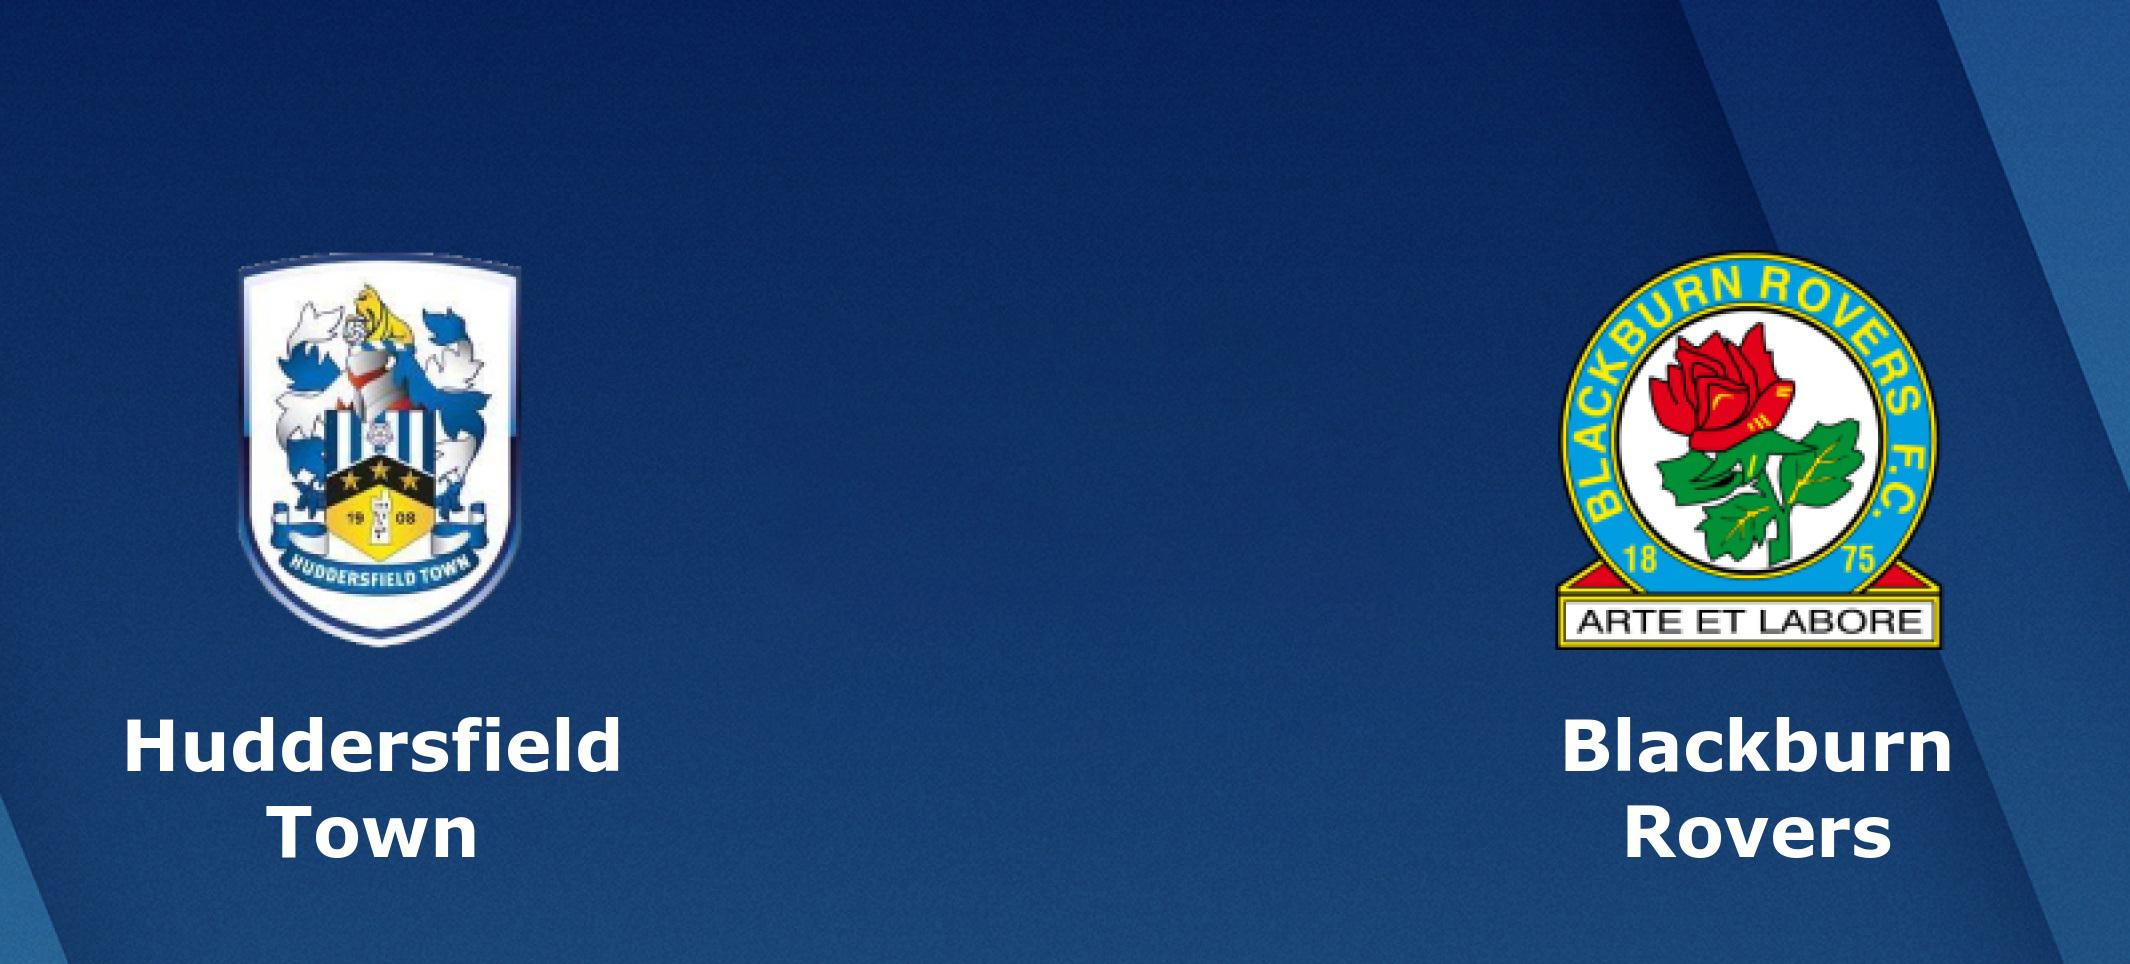 Tip bong da tran Huddersfield Town vs Blackburn Rovers – 22h00 - 29122019 – Giai Hang Nhat Anh FA (5)